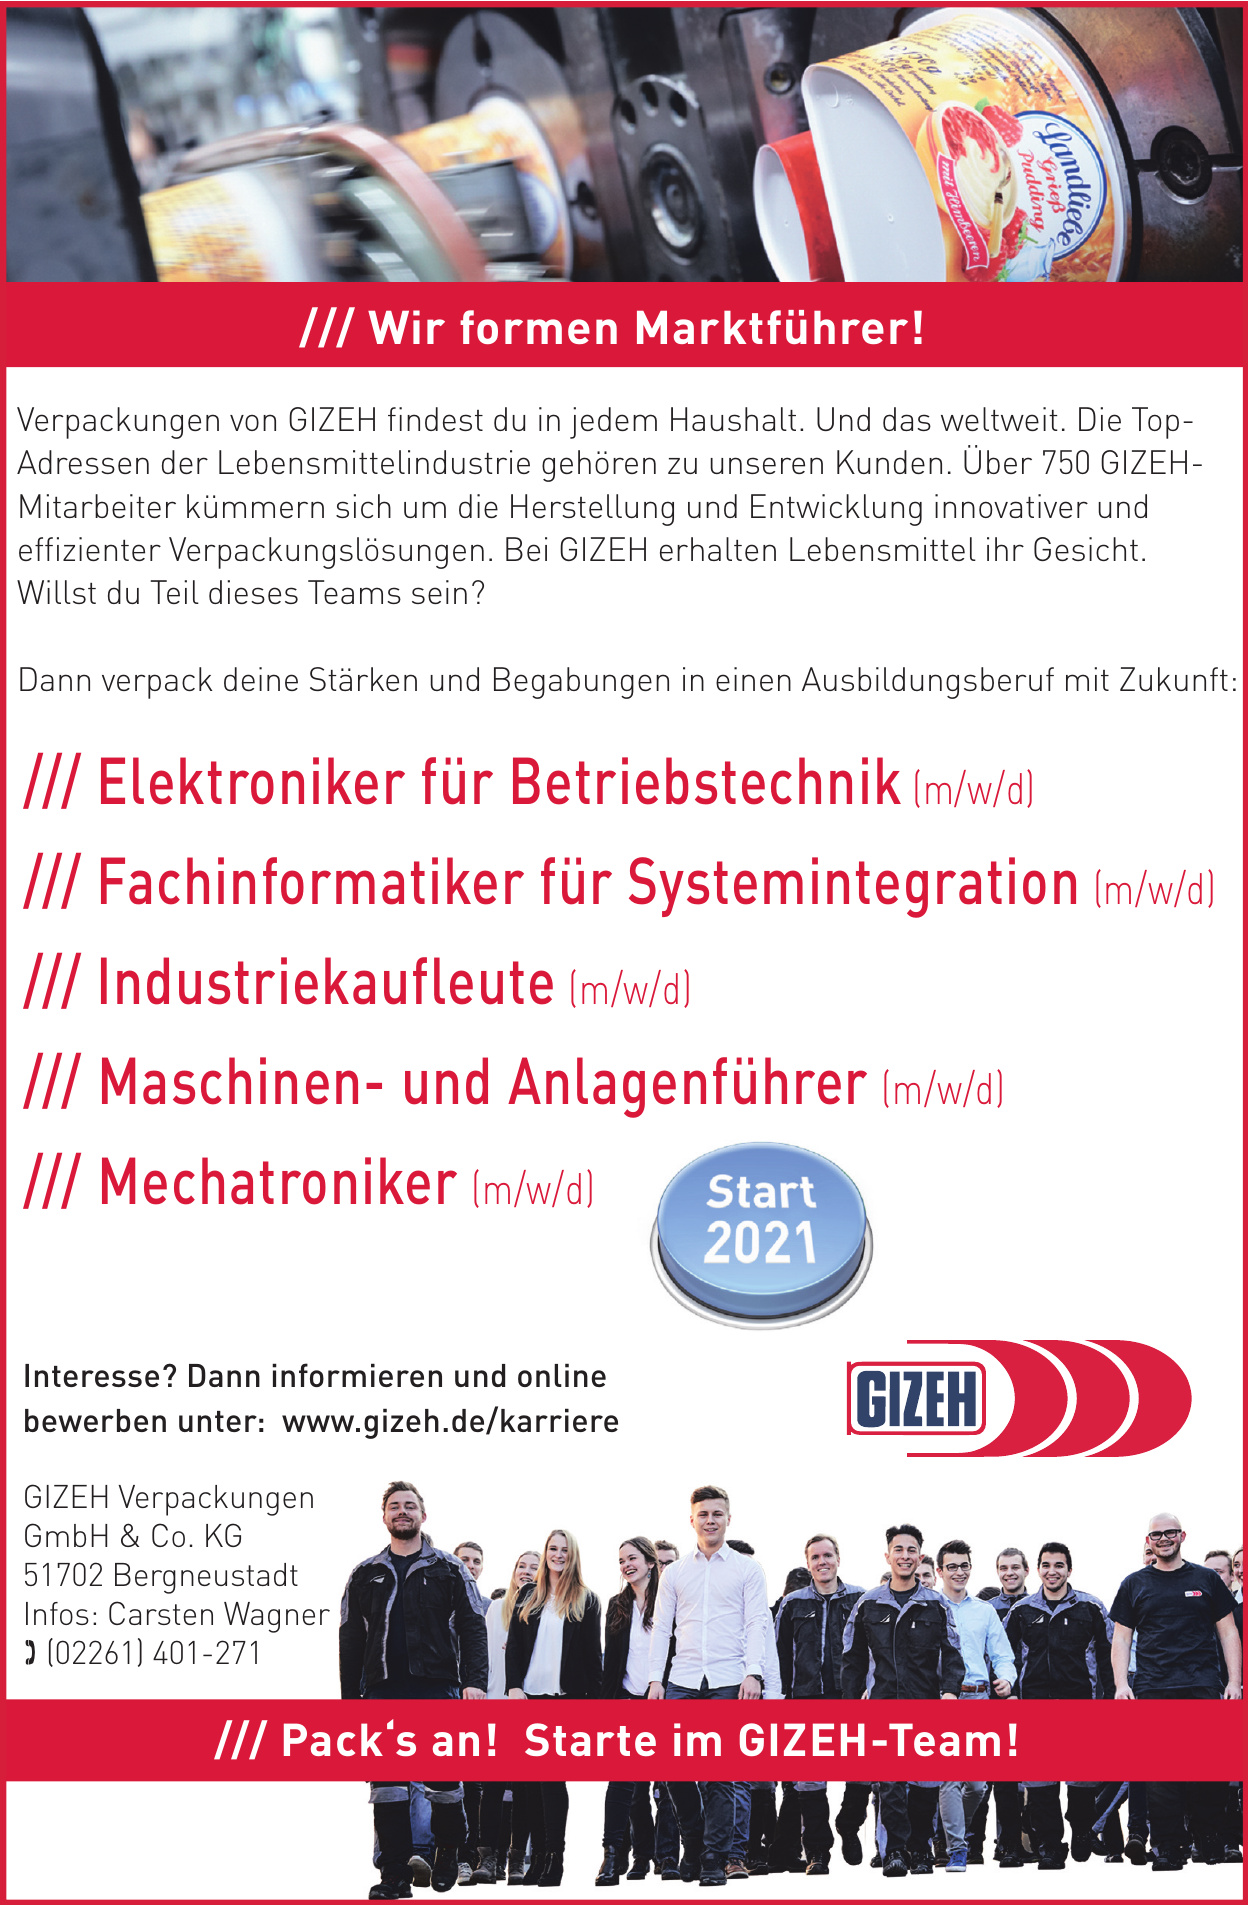 GIZEH Verpackungen GmbH & Co. KG